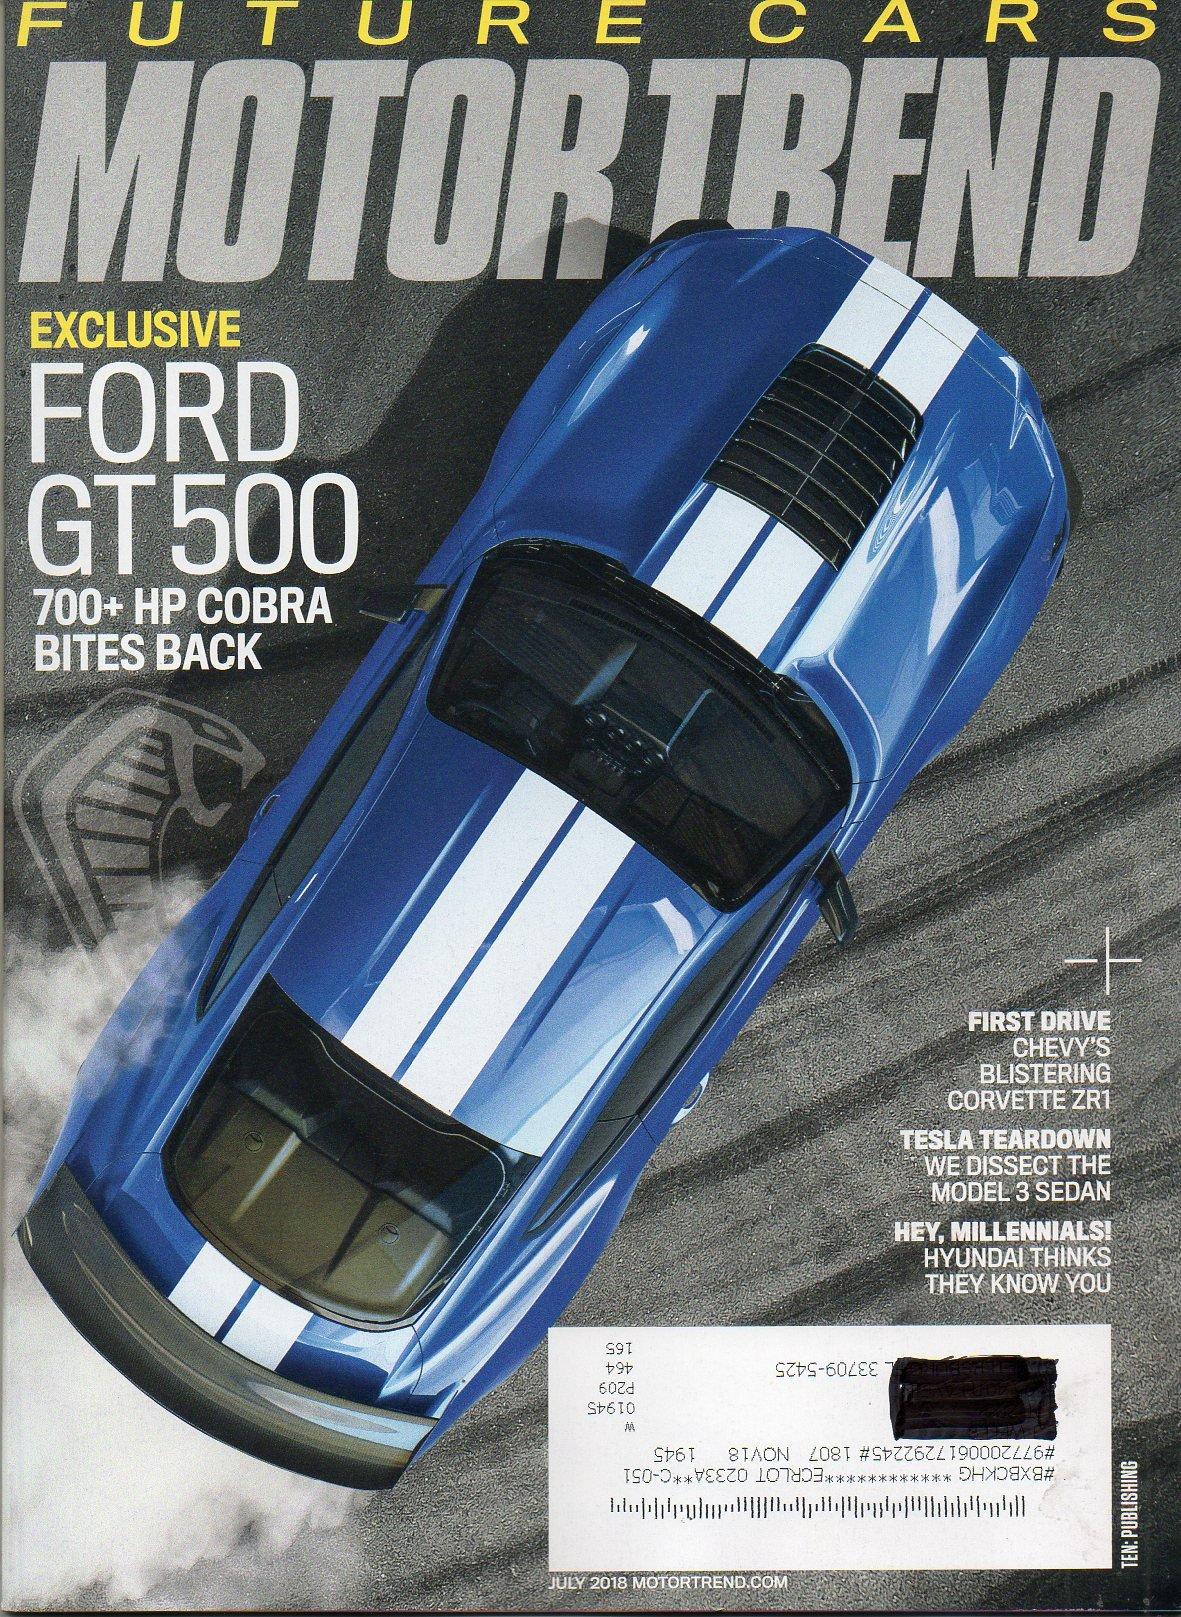 Read Online FUTURE CARS BEYOND 2018 Reinventing The Wheel ATESLA TEARDOWN: WE DISSECT THE MODEL 3 SEDAN Motor Trend First Drive CHEVY'S BLISTERING CORVETTE ZR1 John Drafcik Interview CEO Waymo PDF